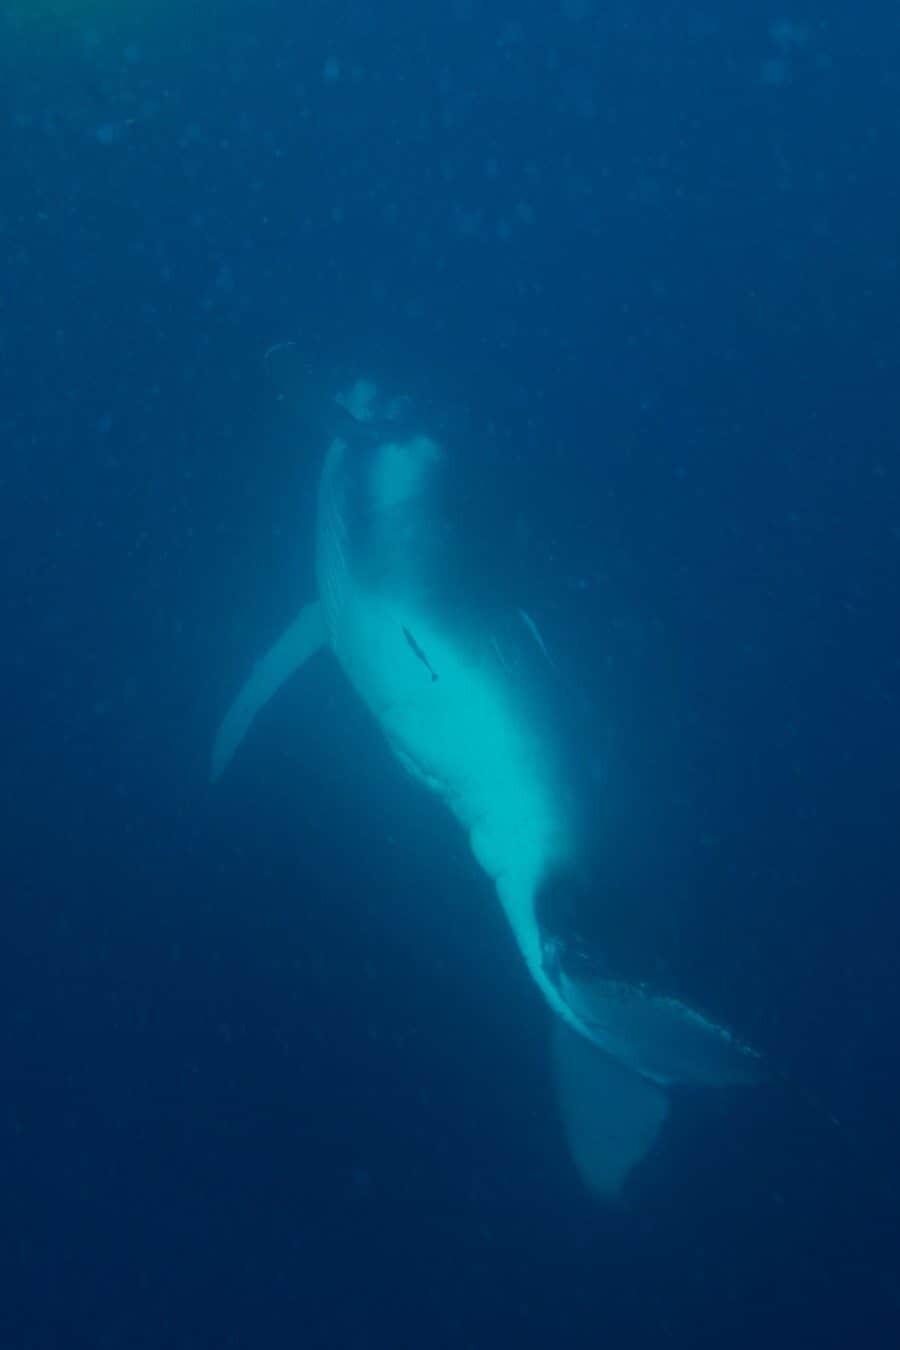 sunshine-coast-whale-swim-by-the-wandering-lens-sunreef-mooloolaba-4